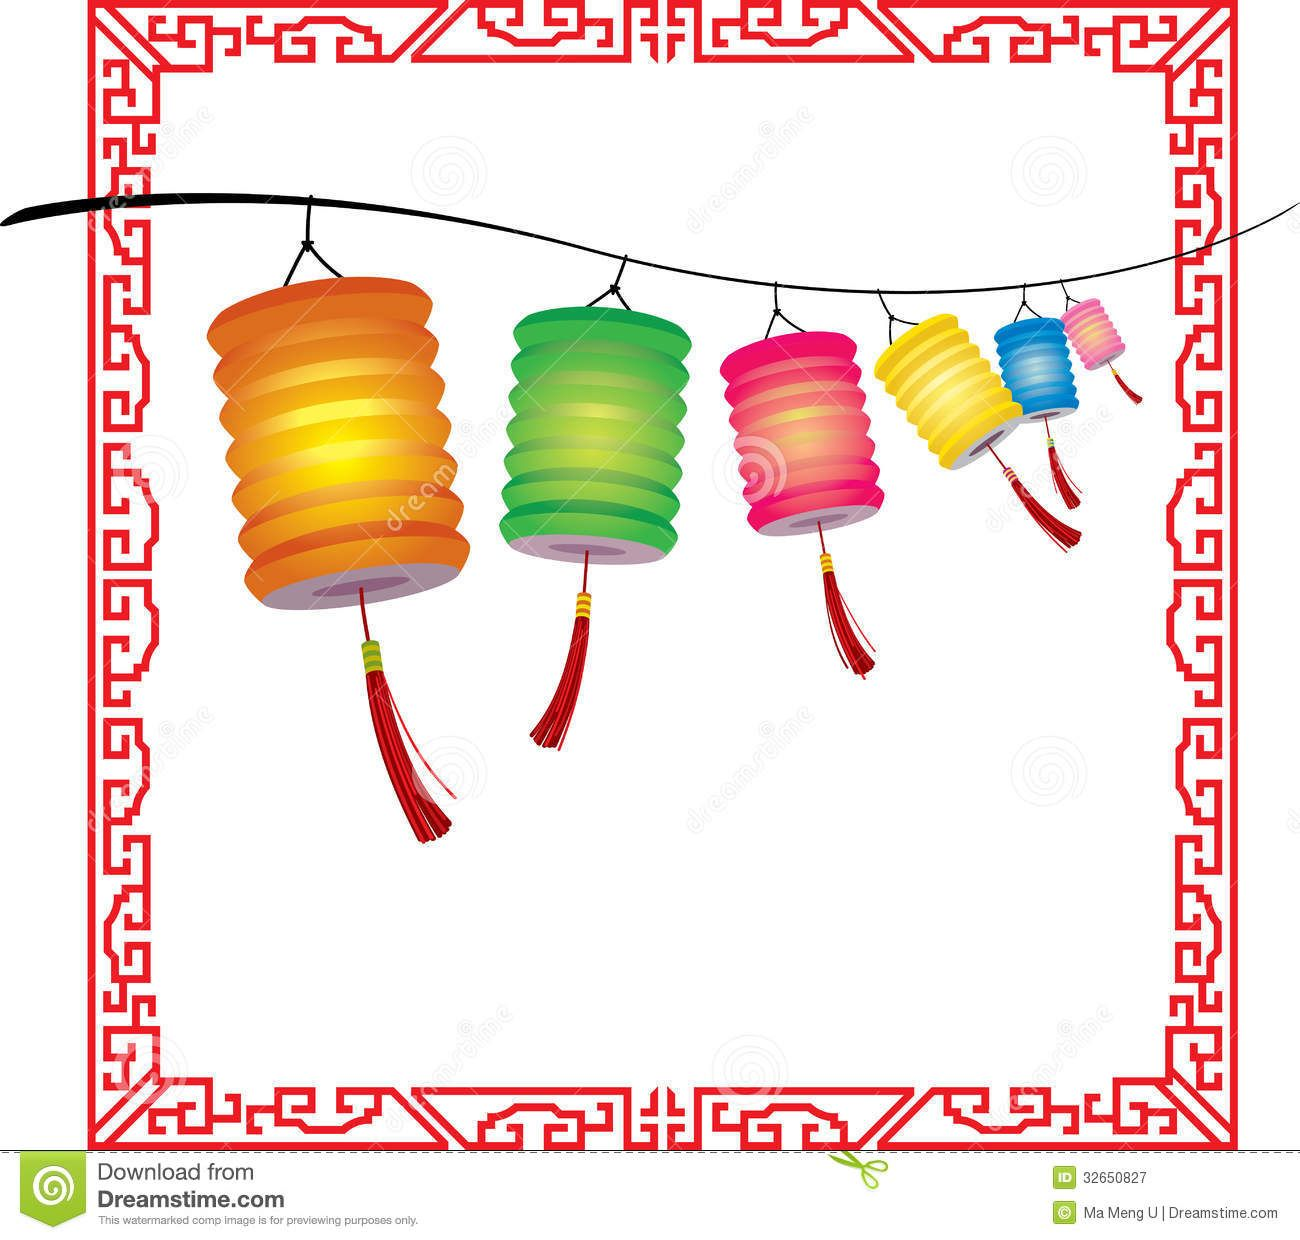 Mid autumn festival lantern clipart svg transparent stock Clipart Images clipart lantern festival : String Of Bright ... svg transparent stock